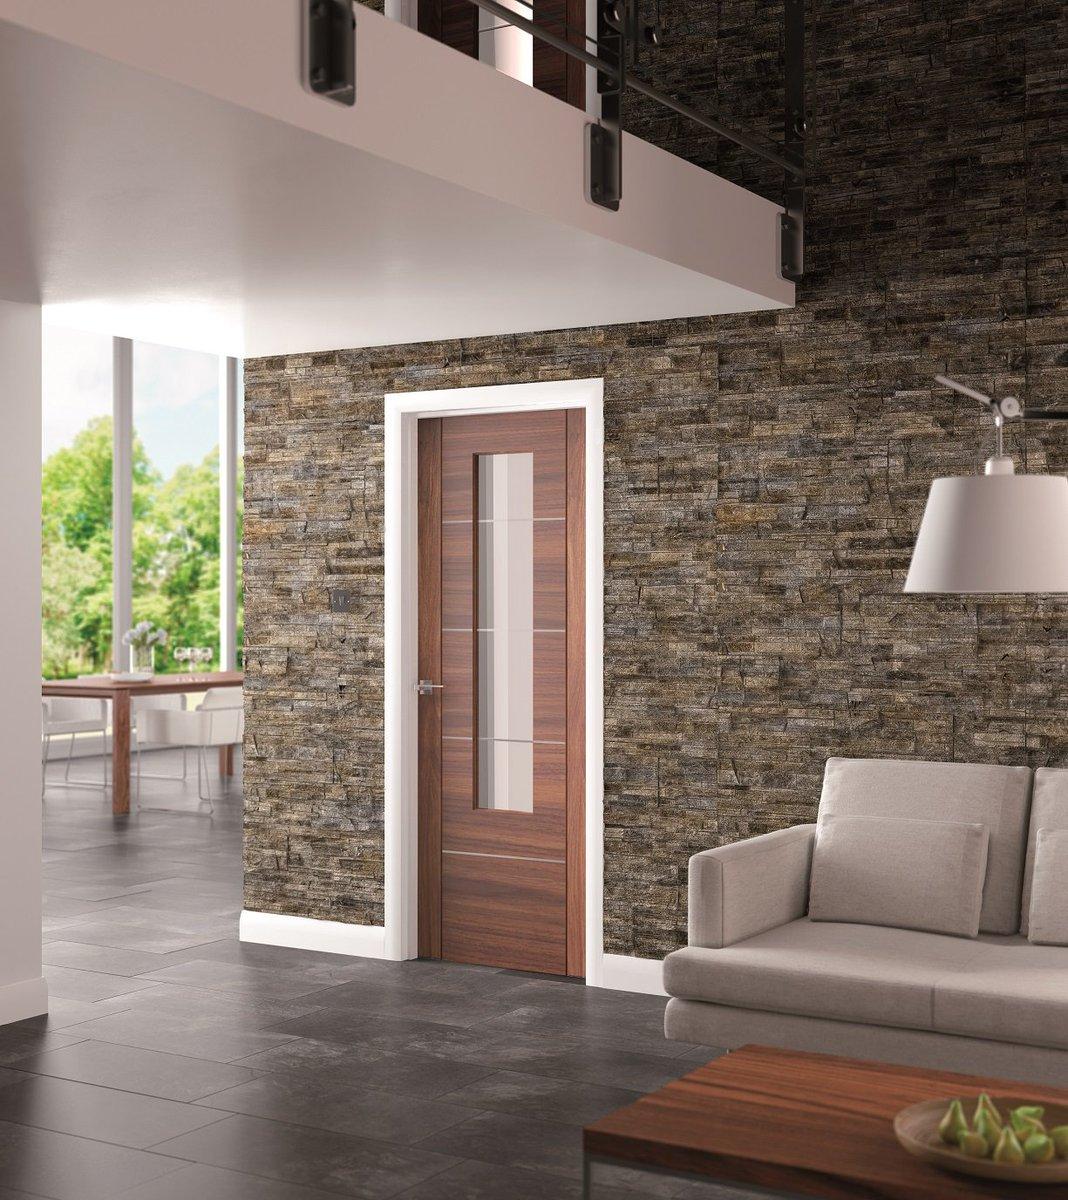 Internal doors external doors and spray finishes from oakwood doors - Oakwood Doors Ltd Added Xl Joinery Xljoinery